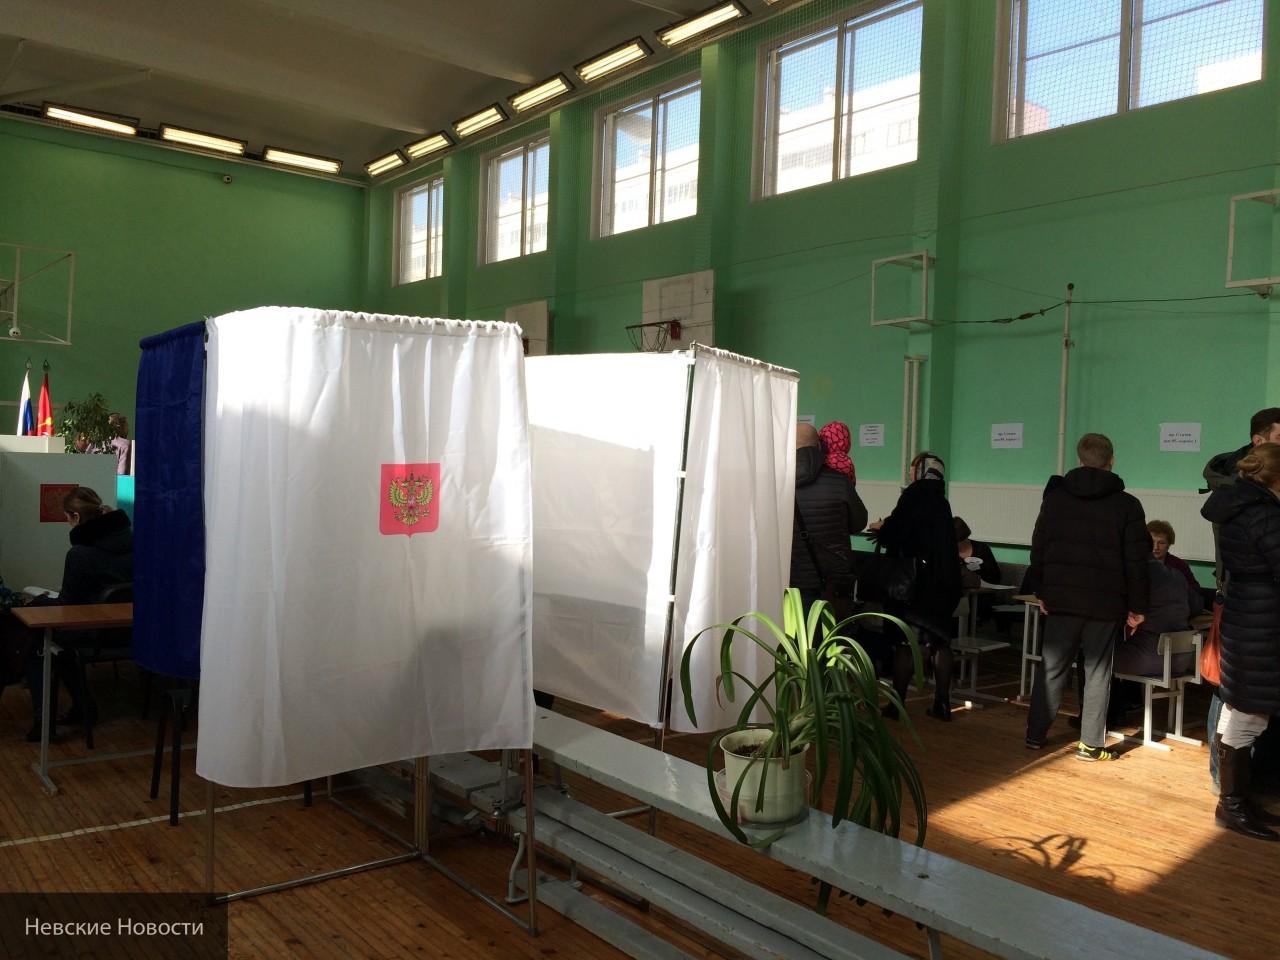 Журналист CNN удивлен активностью граждан на выборах президента России